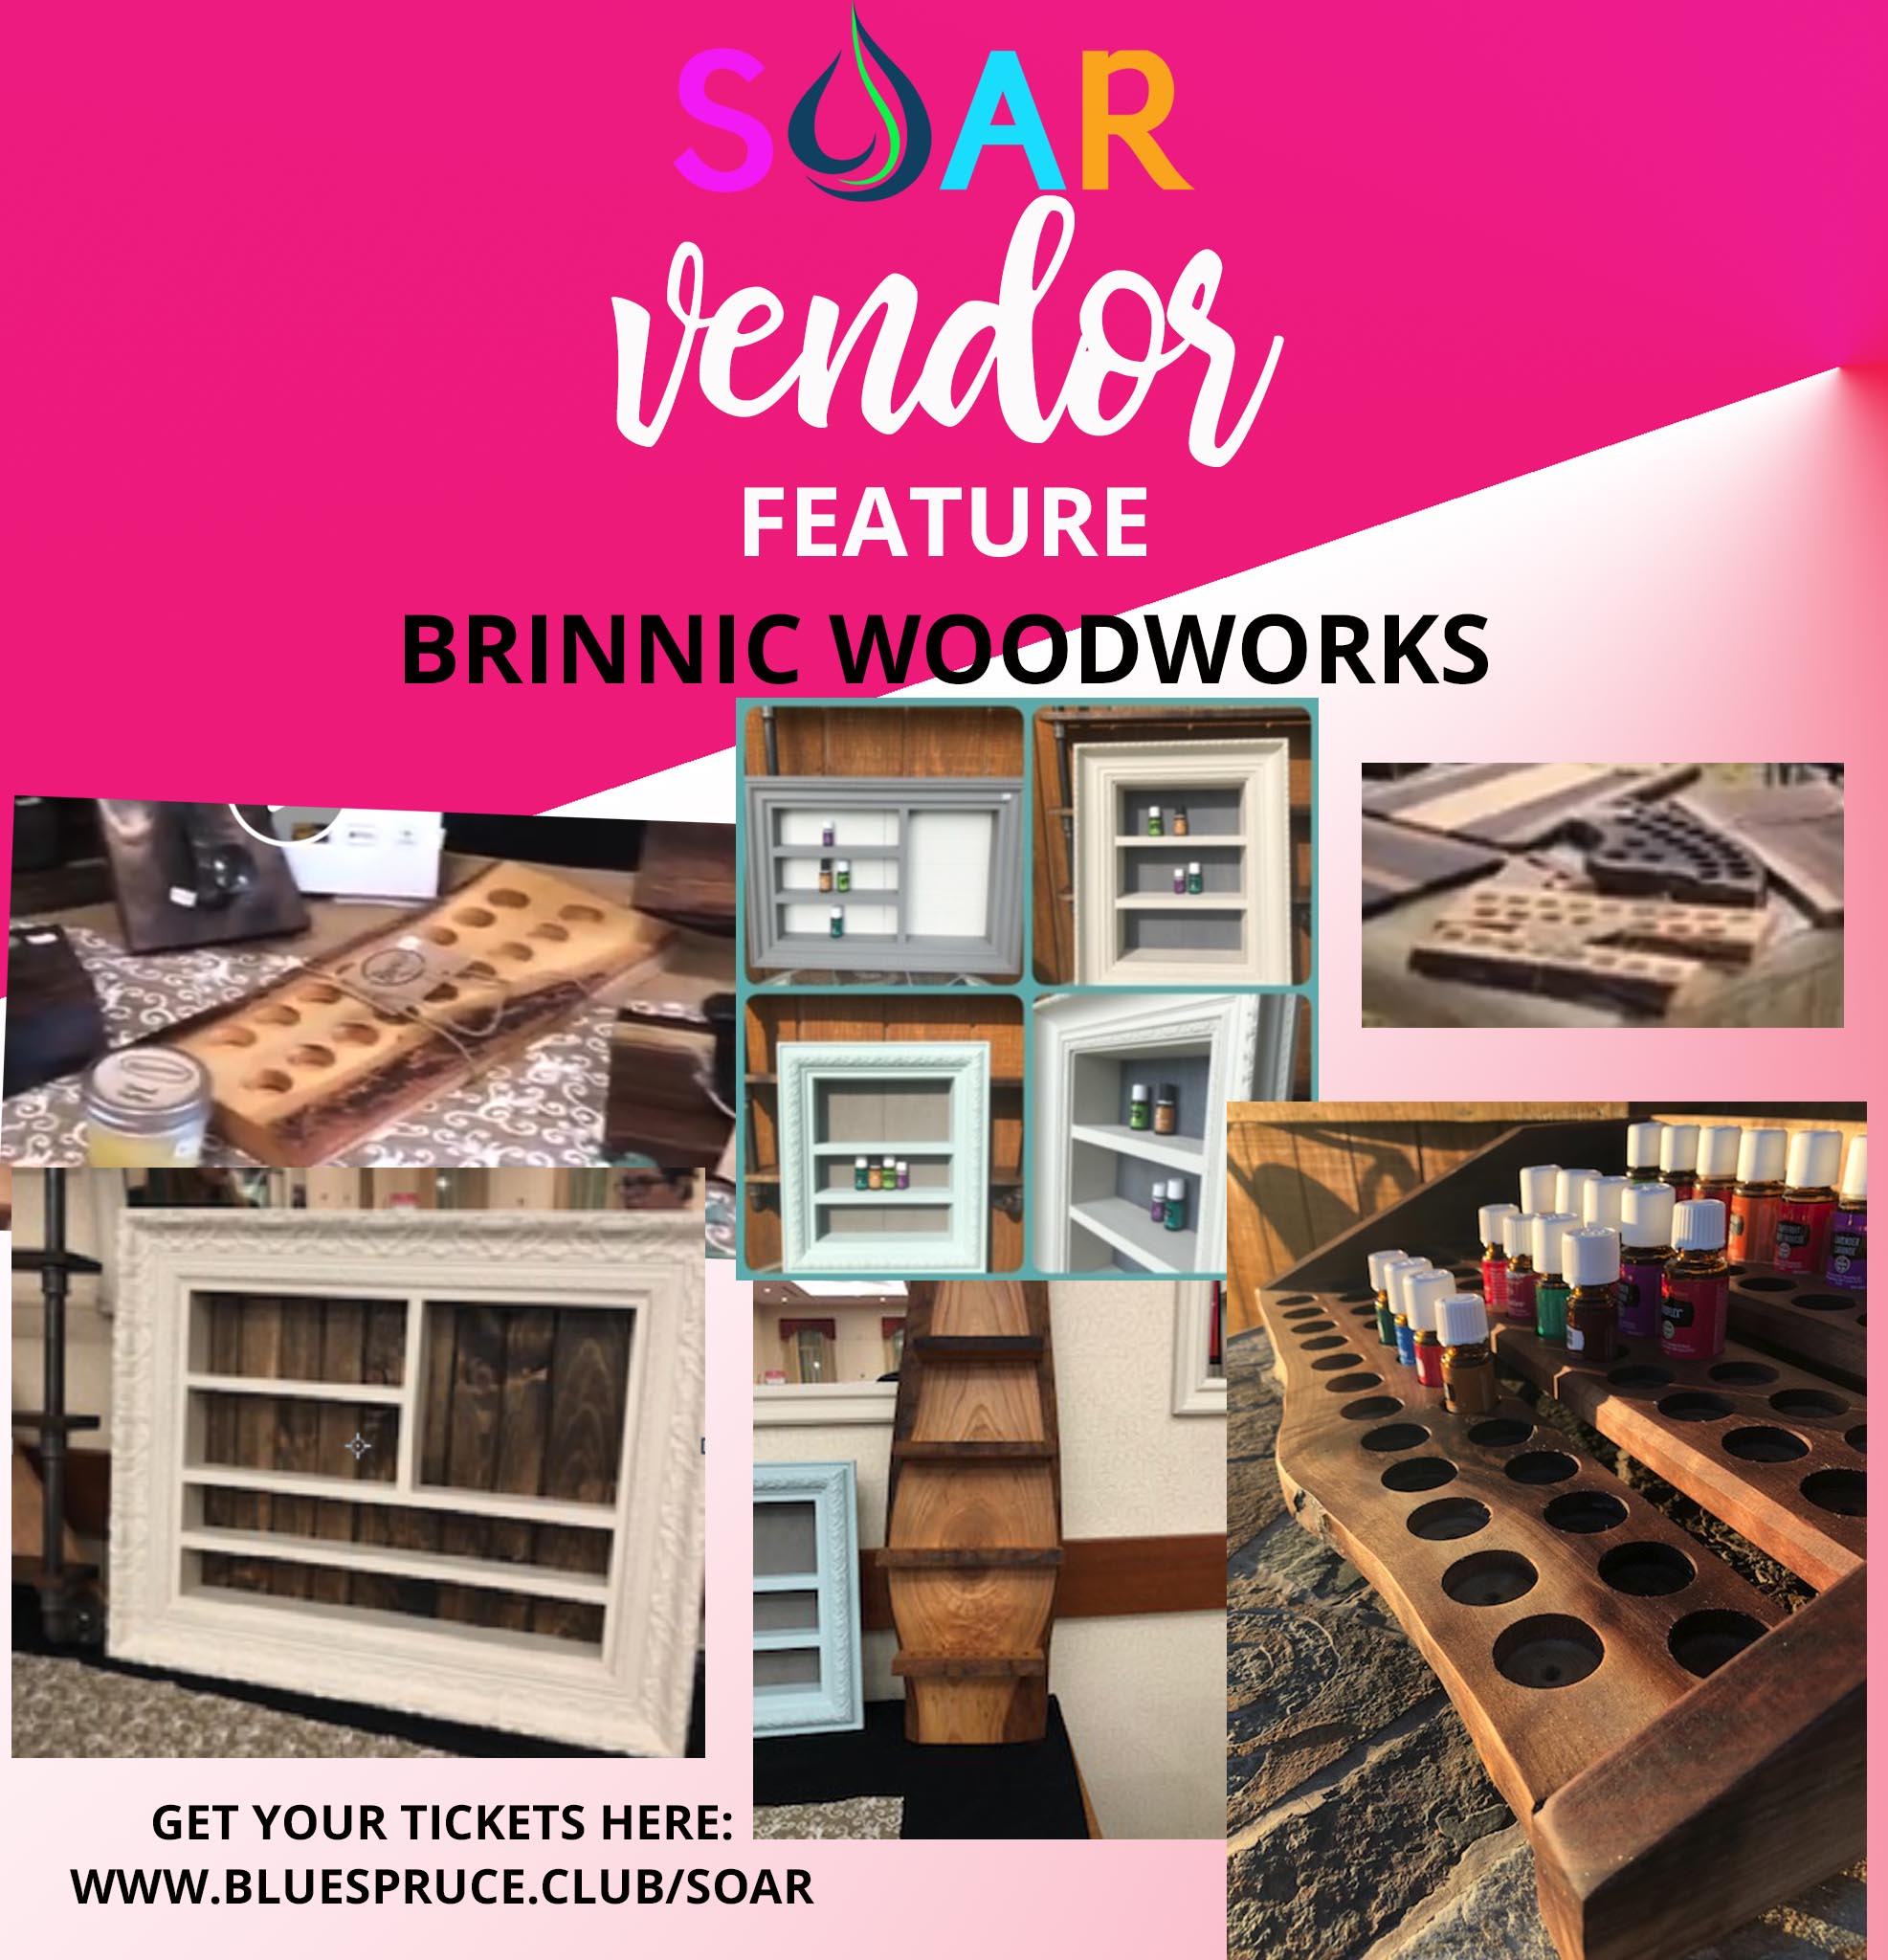 SOAR Vendor feature Brinnic Woodworks.jpg